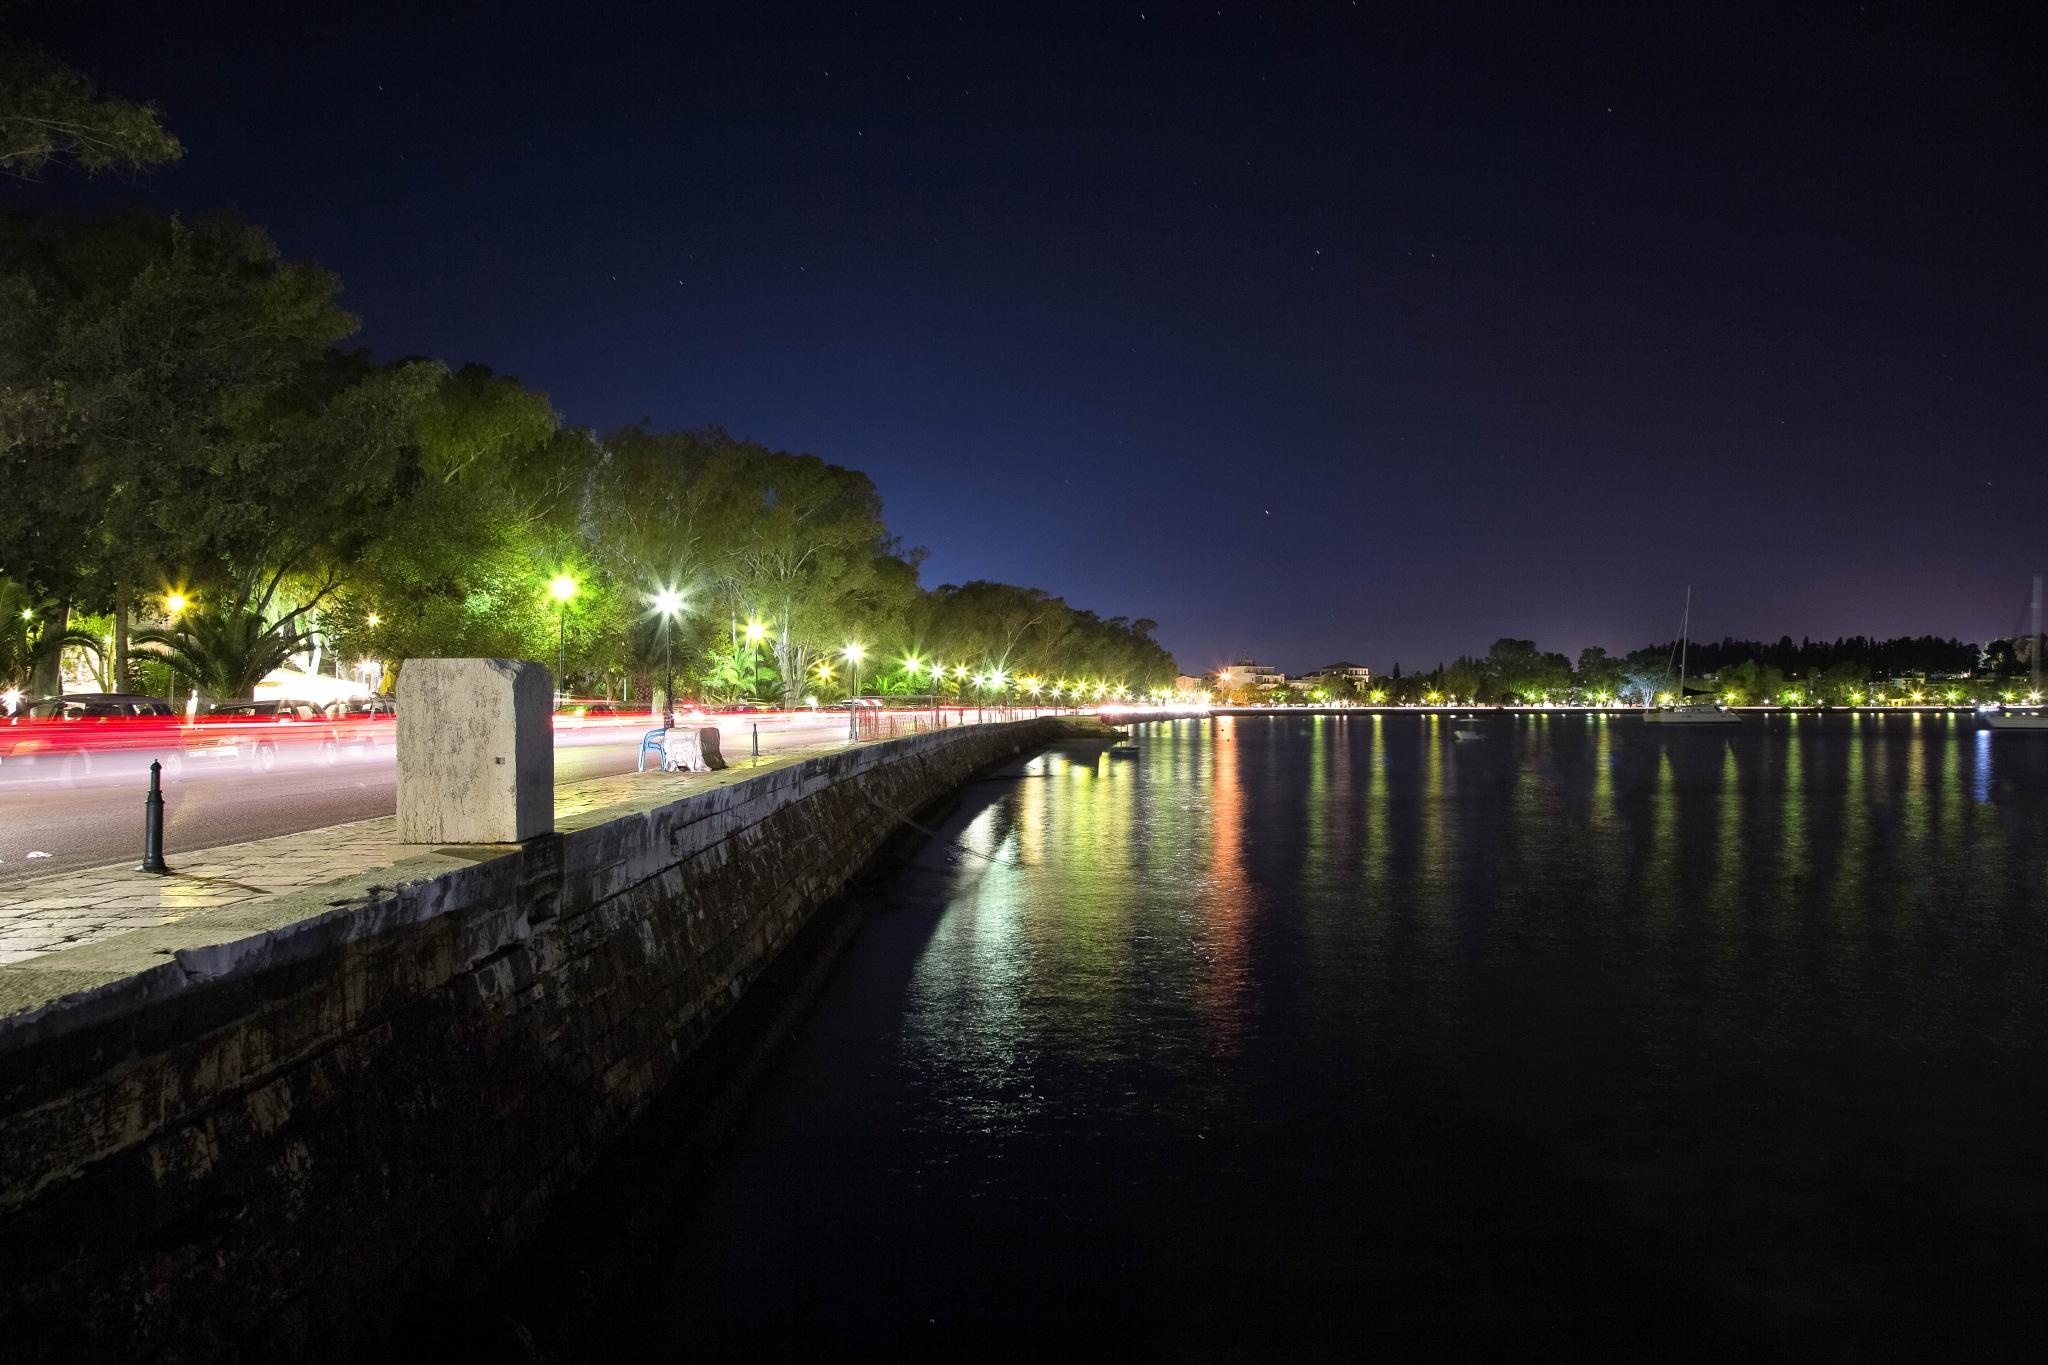 Garitsa bay Light Trails by Stylianos lavranos